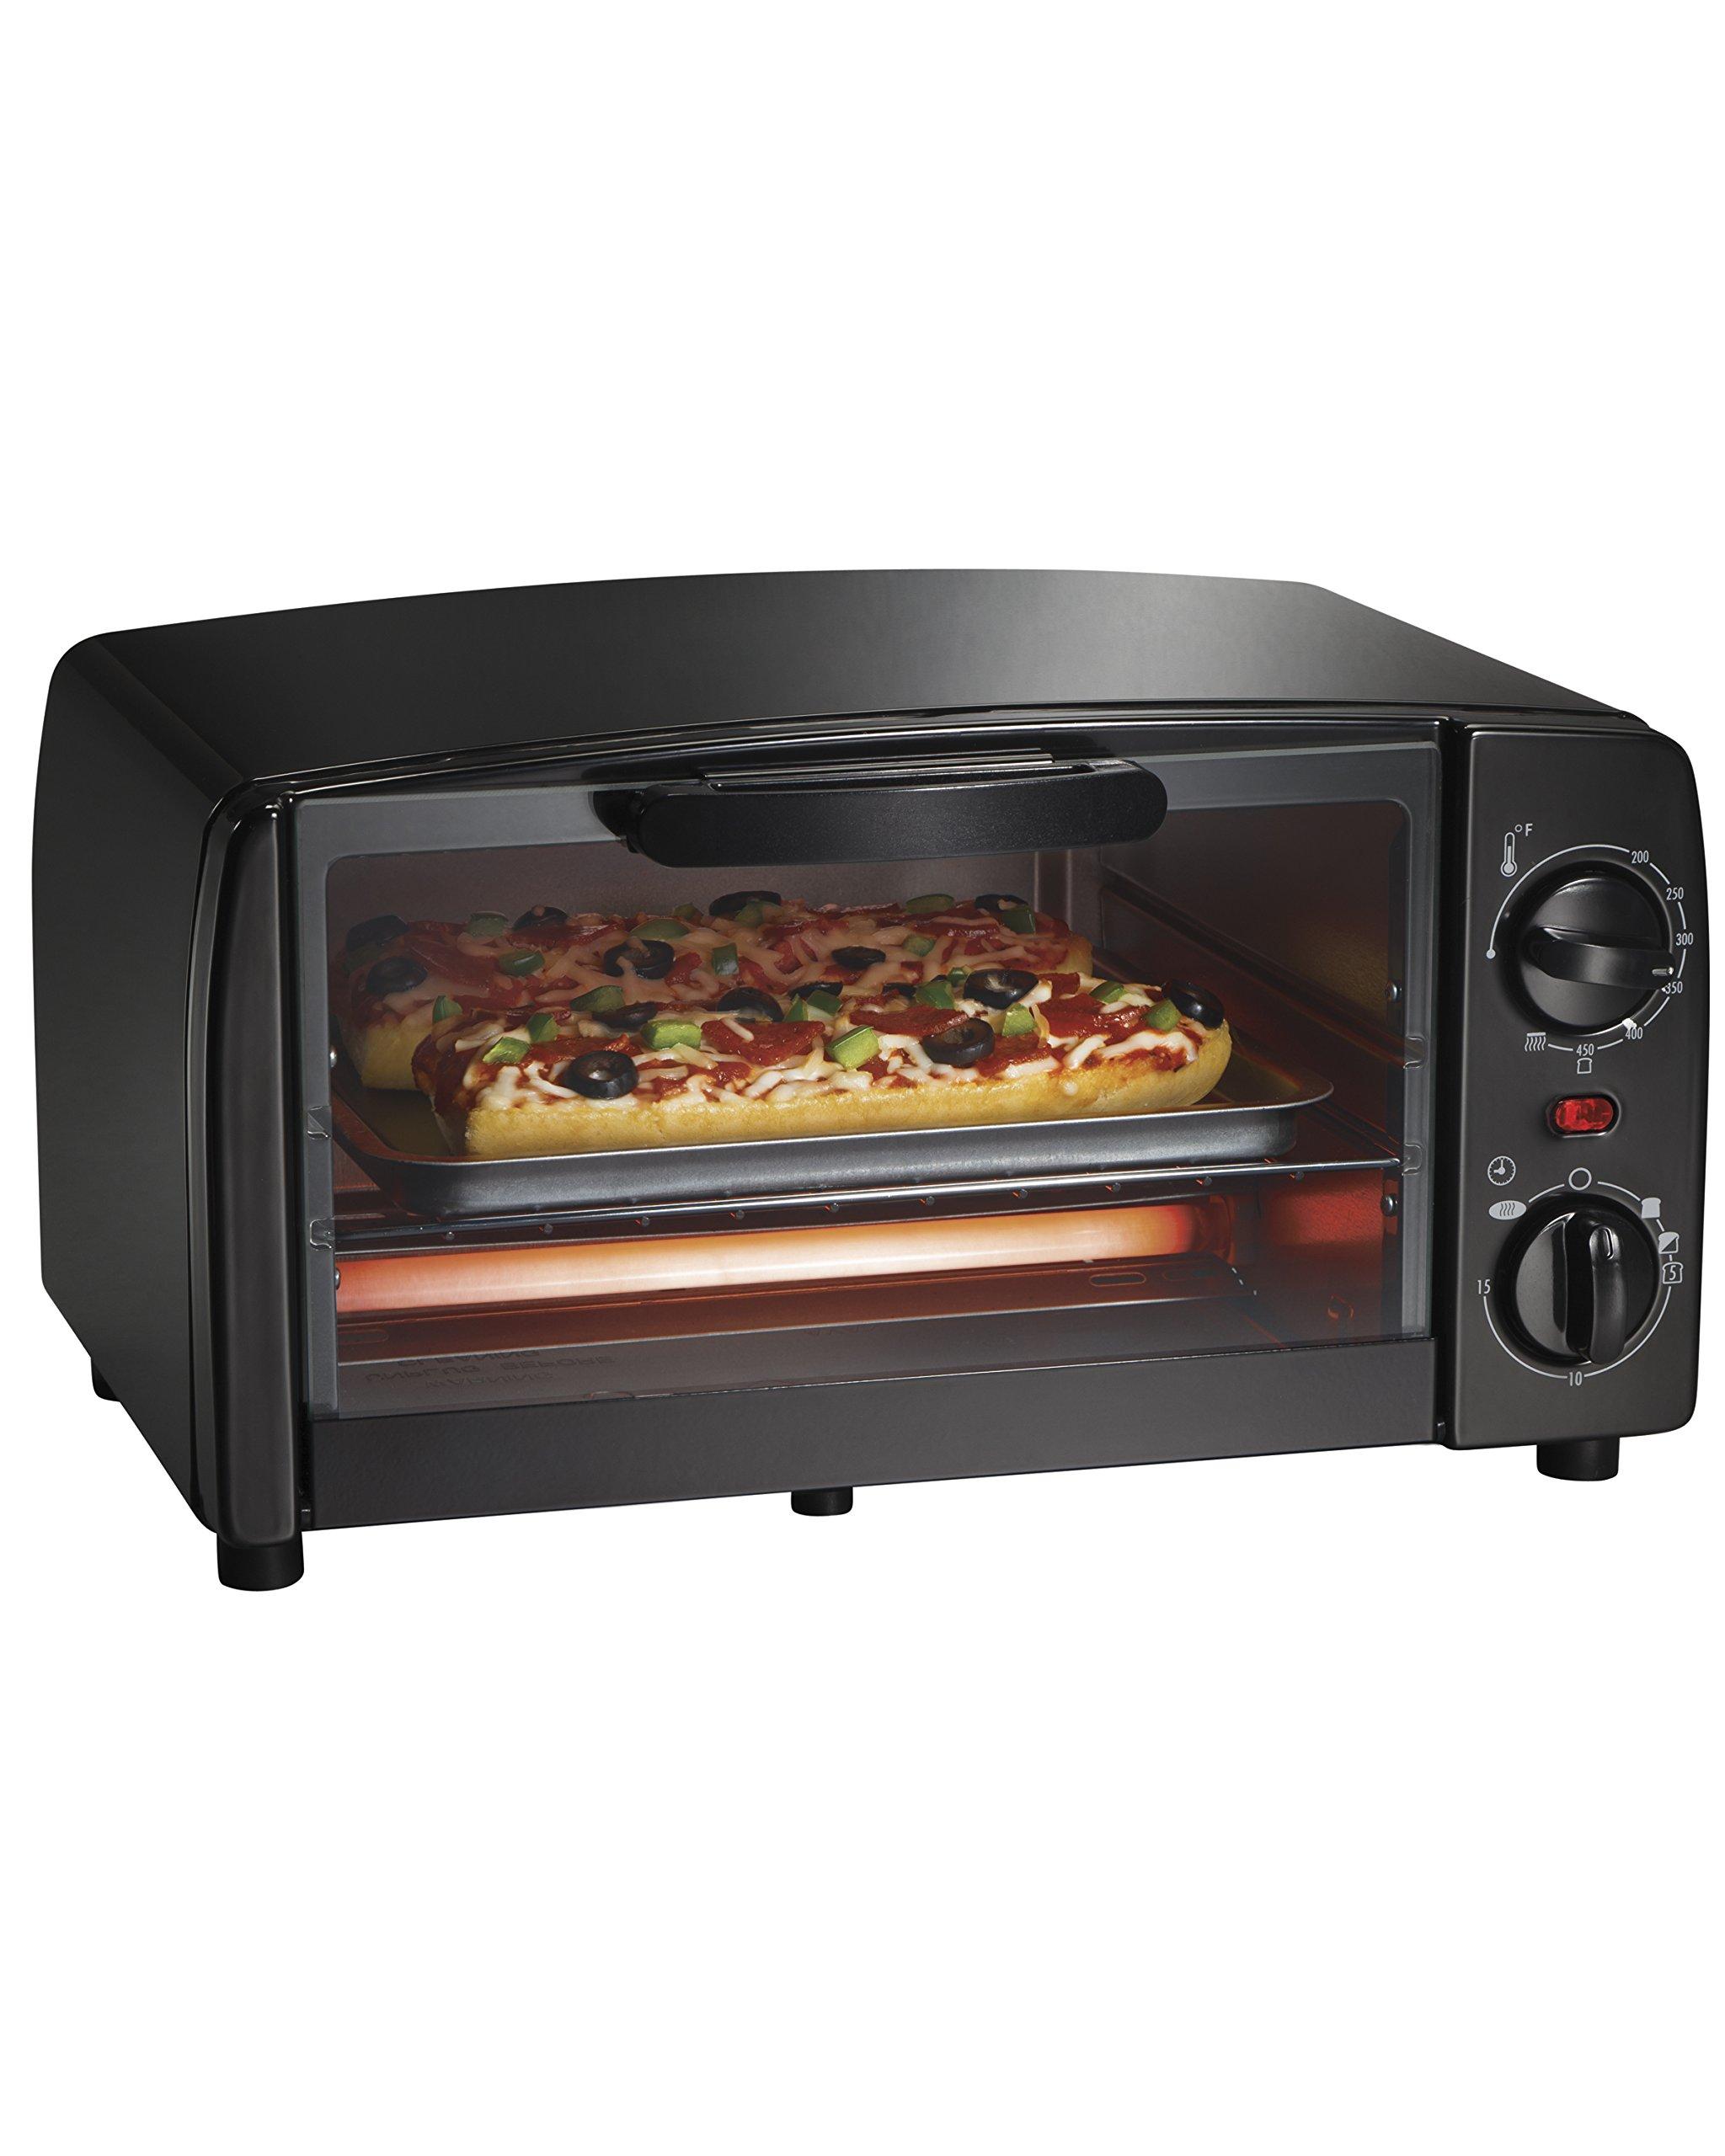 Hamilton Beach Proctor Silex 4-Slice Toaster Oven, Black (31118R), One Size, by Hamilton Beach